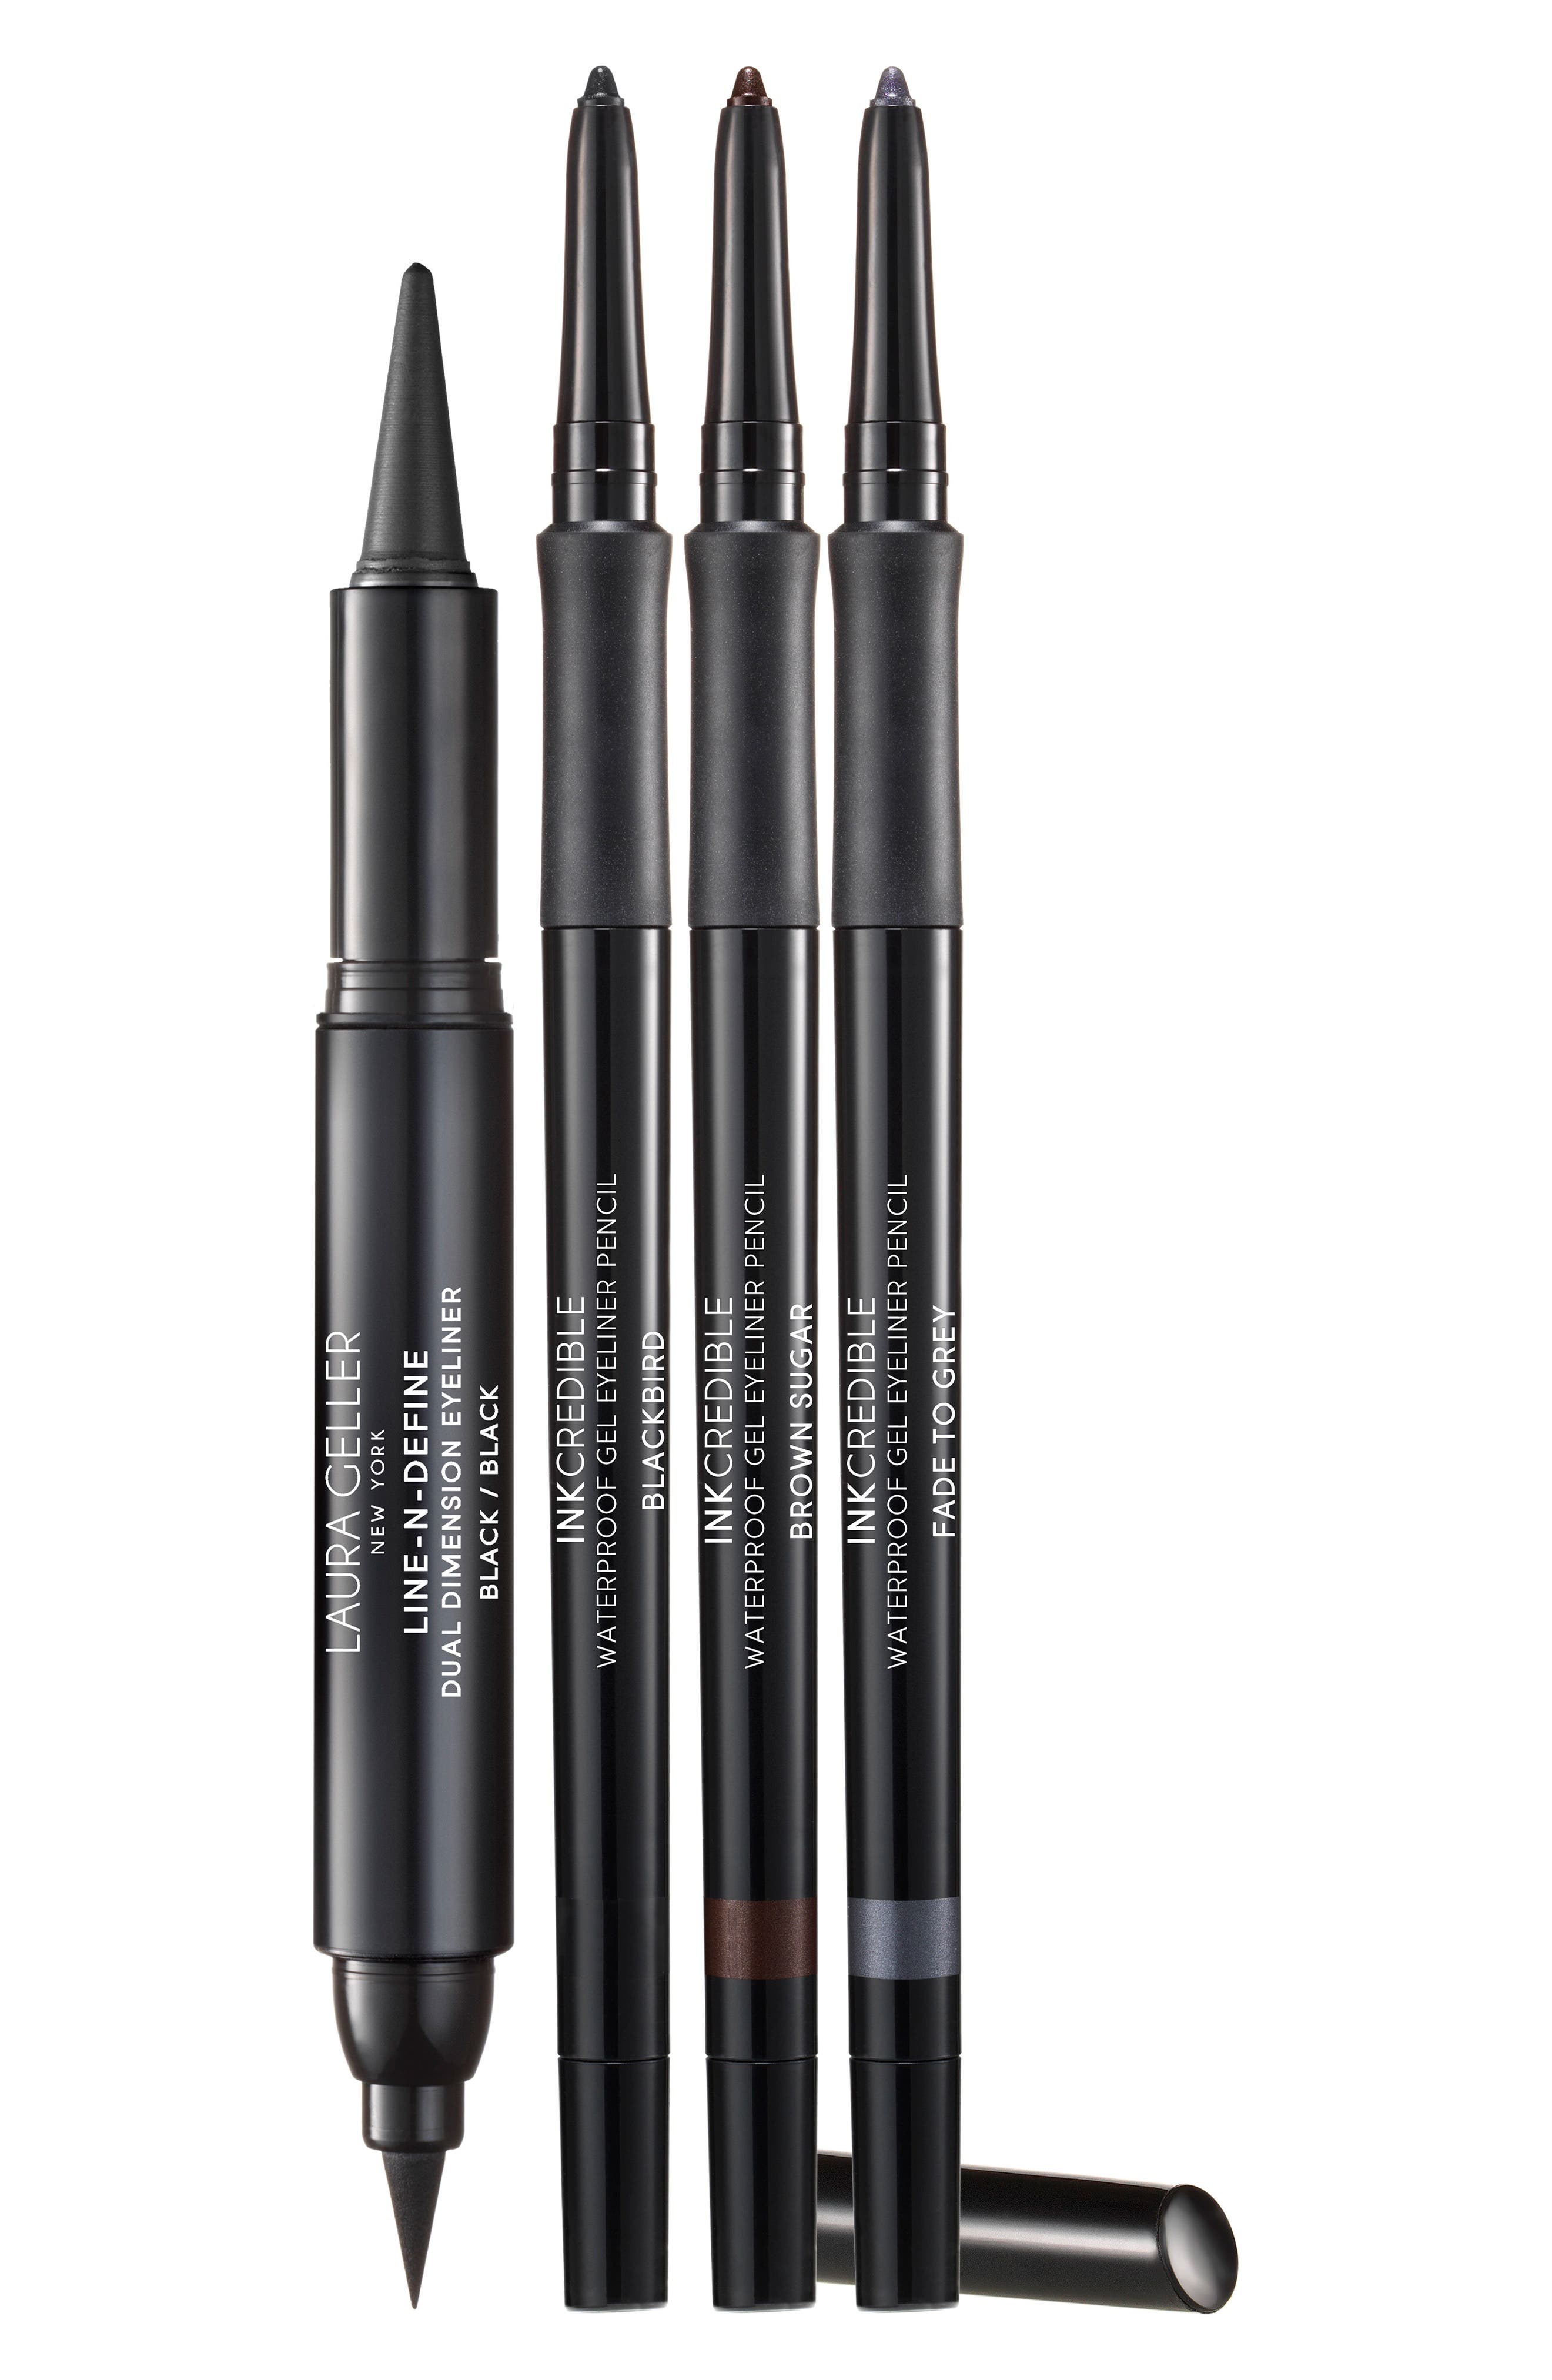 Laura Geller Beauty Smoke Show Eyeliner Kit - No Color